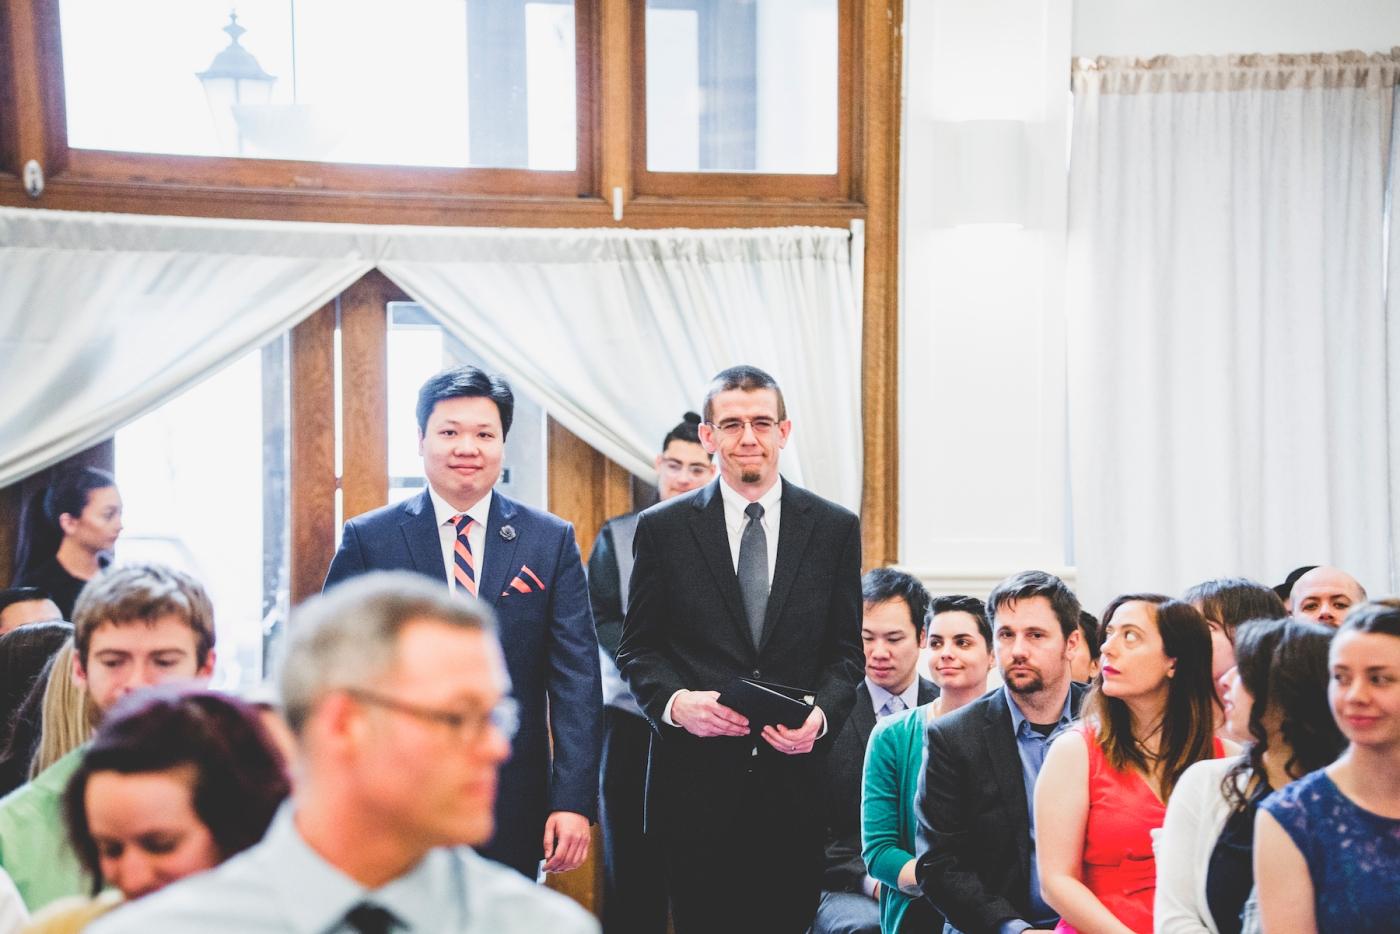 DSC_2490Everett_Wedding_Ballroom_Jane_Speleers_photography_Rachel_and_Edmund_Ceremony_2017